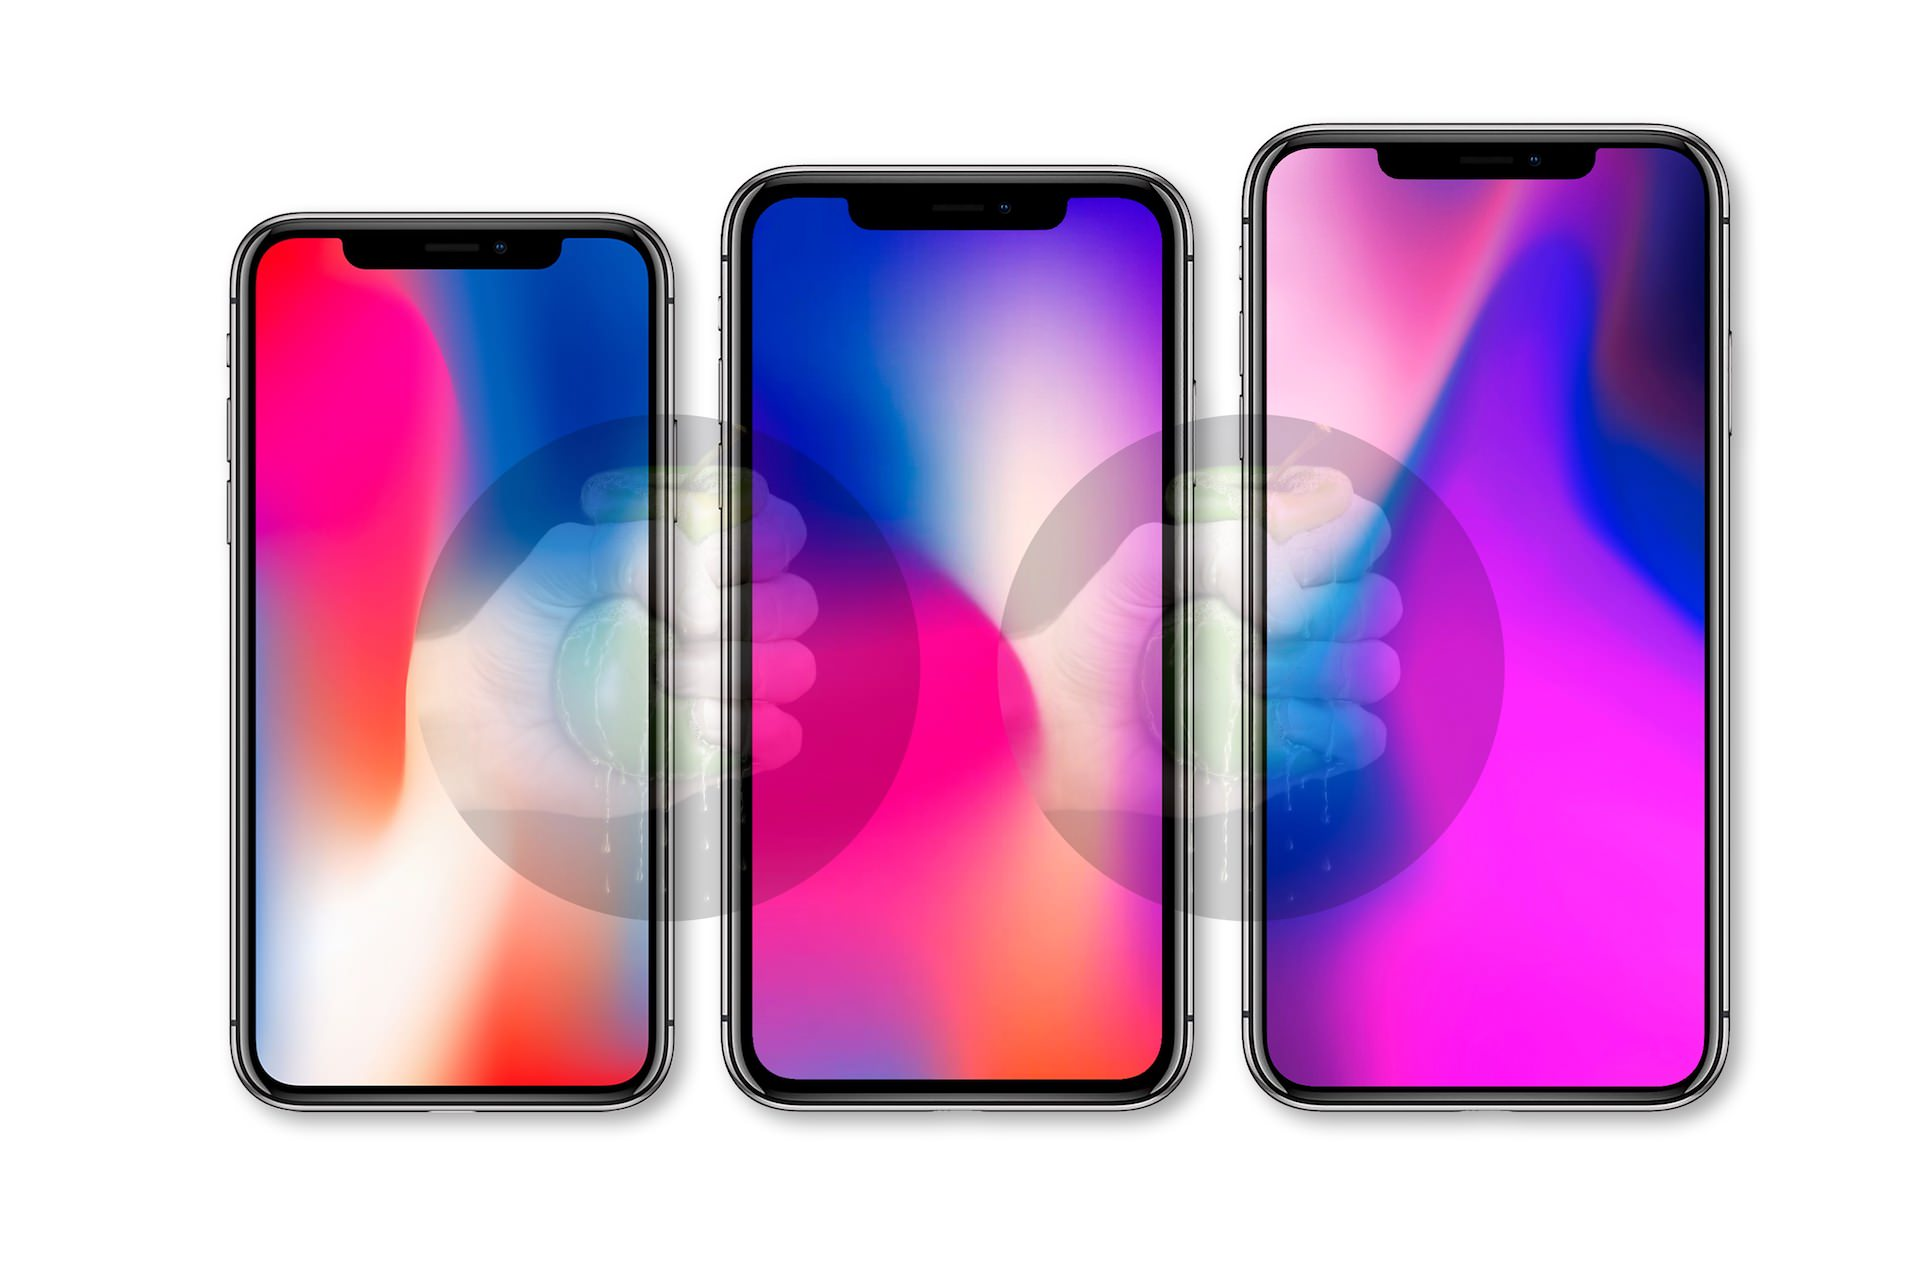 iPhone-9-wylsacom-1.jpg